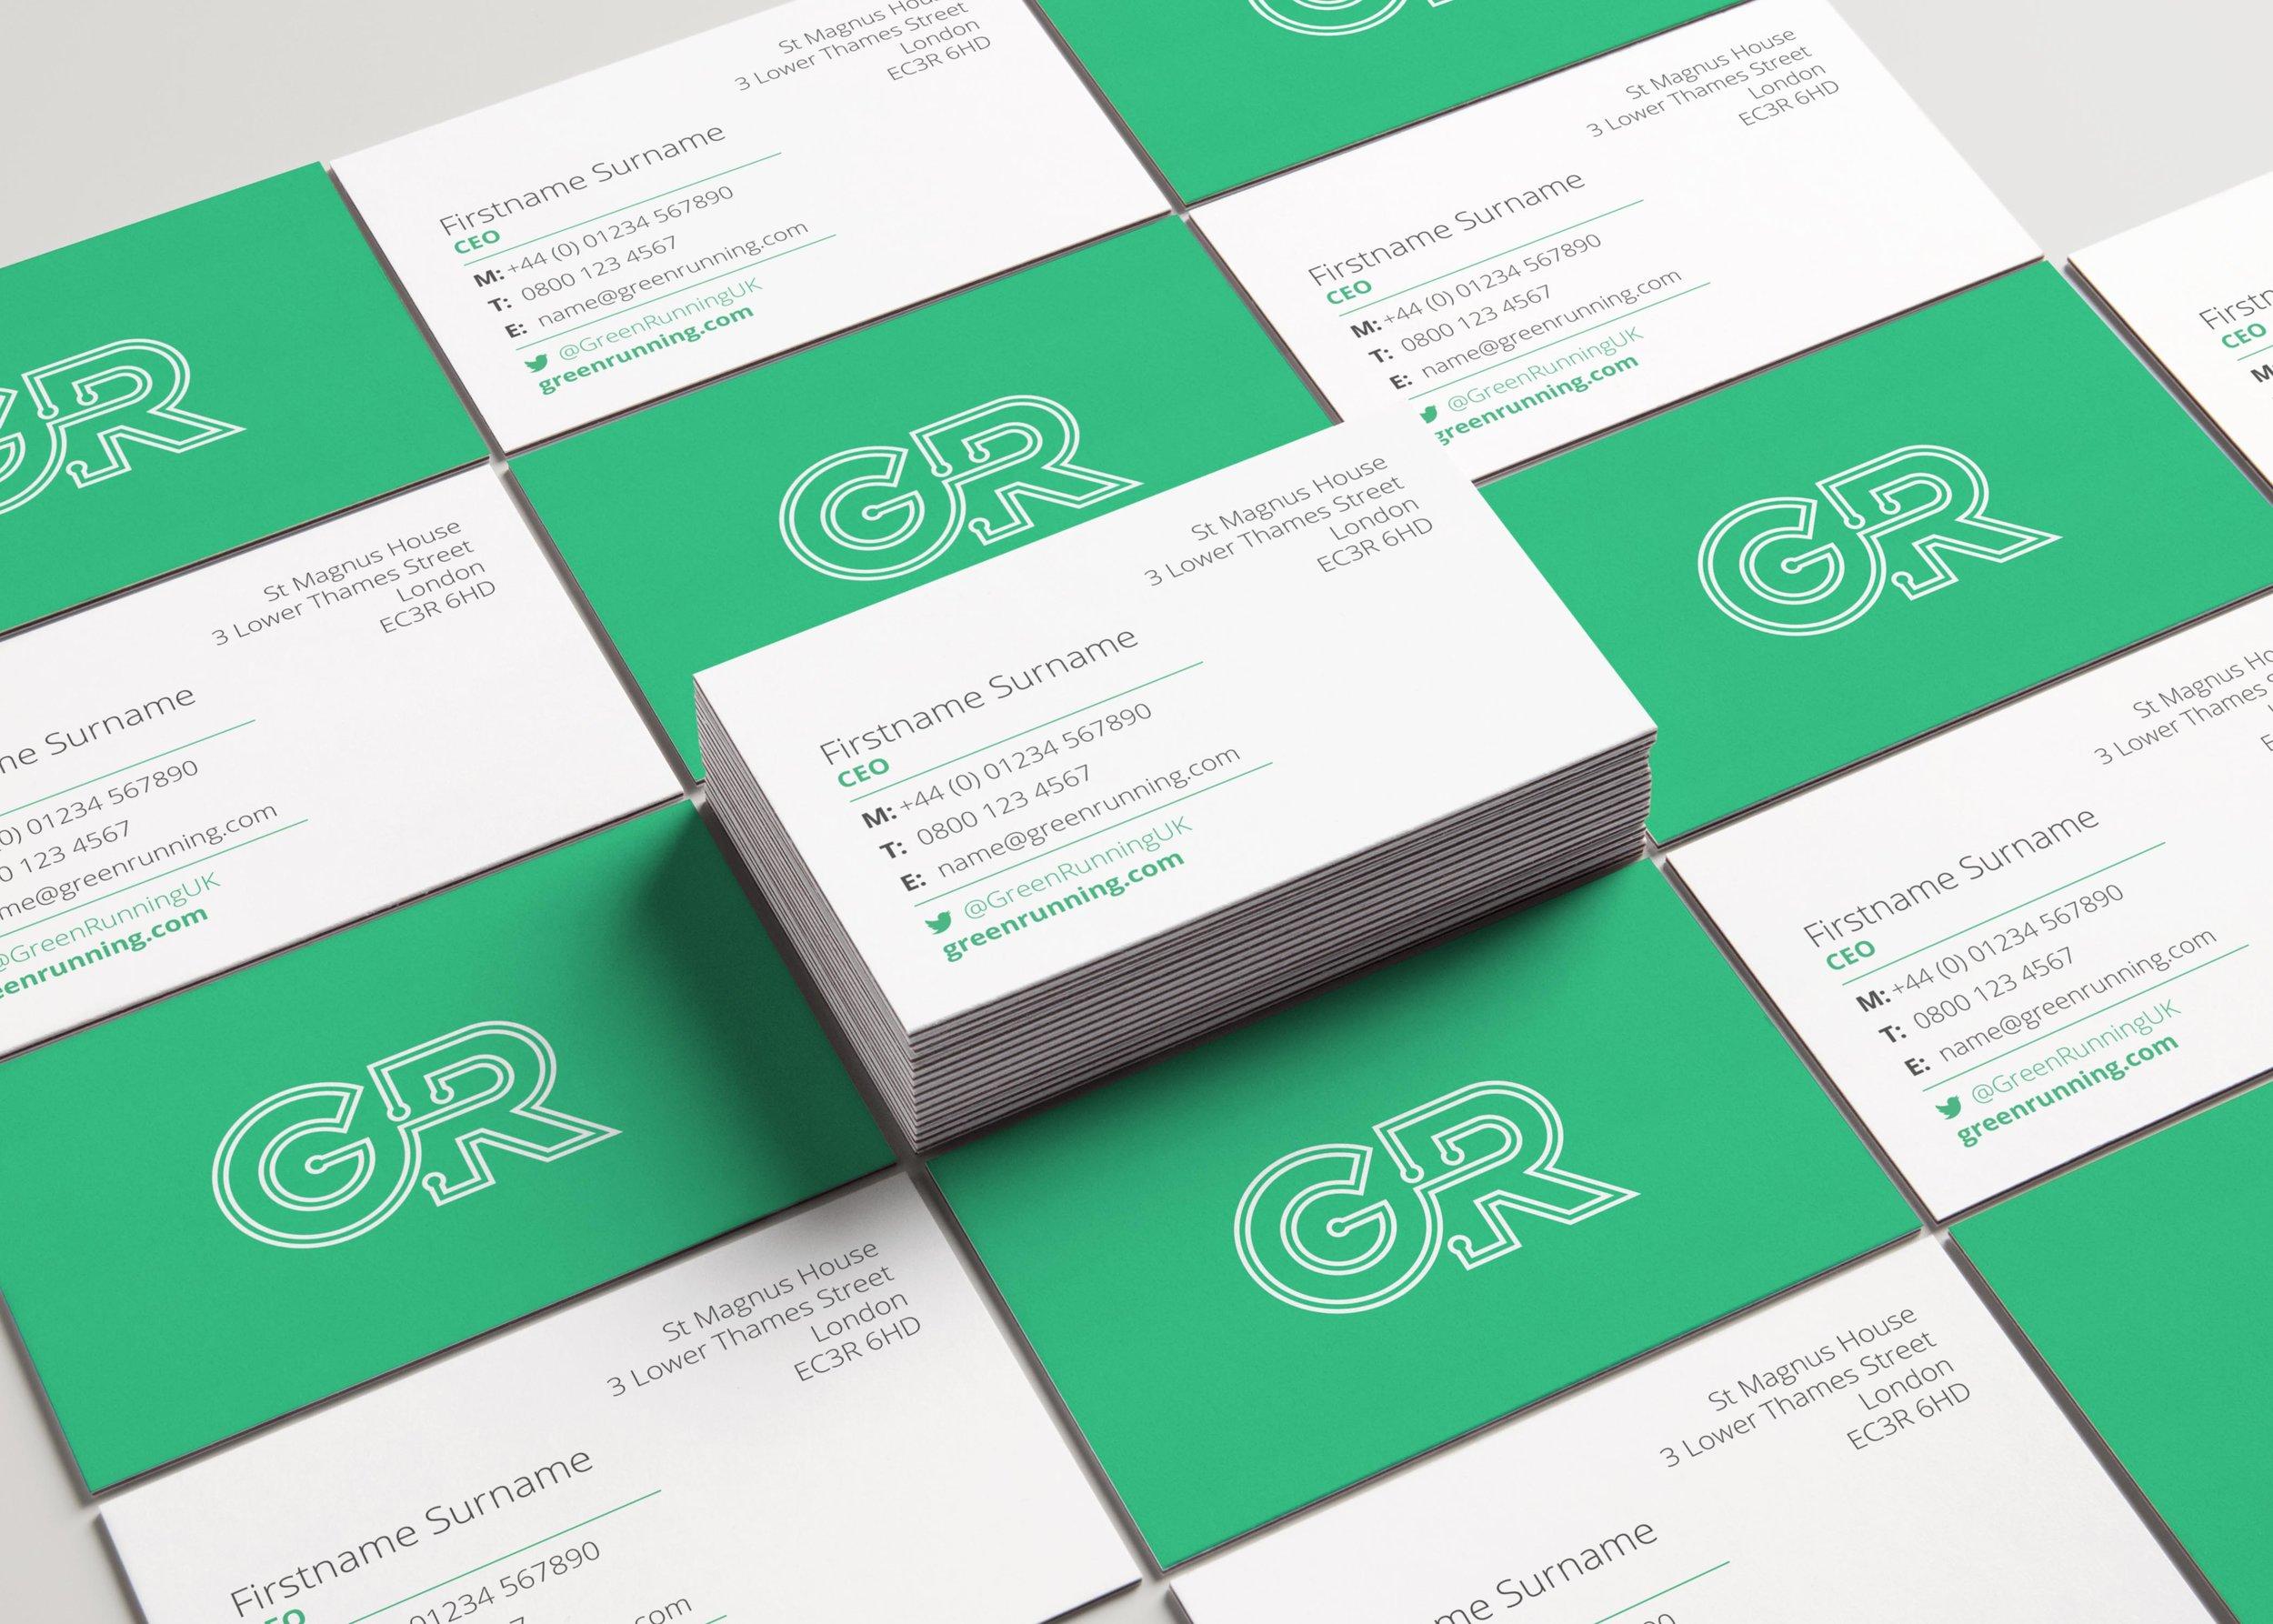 GR Business Cards.jpg